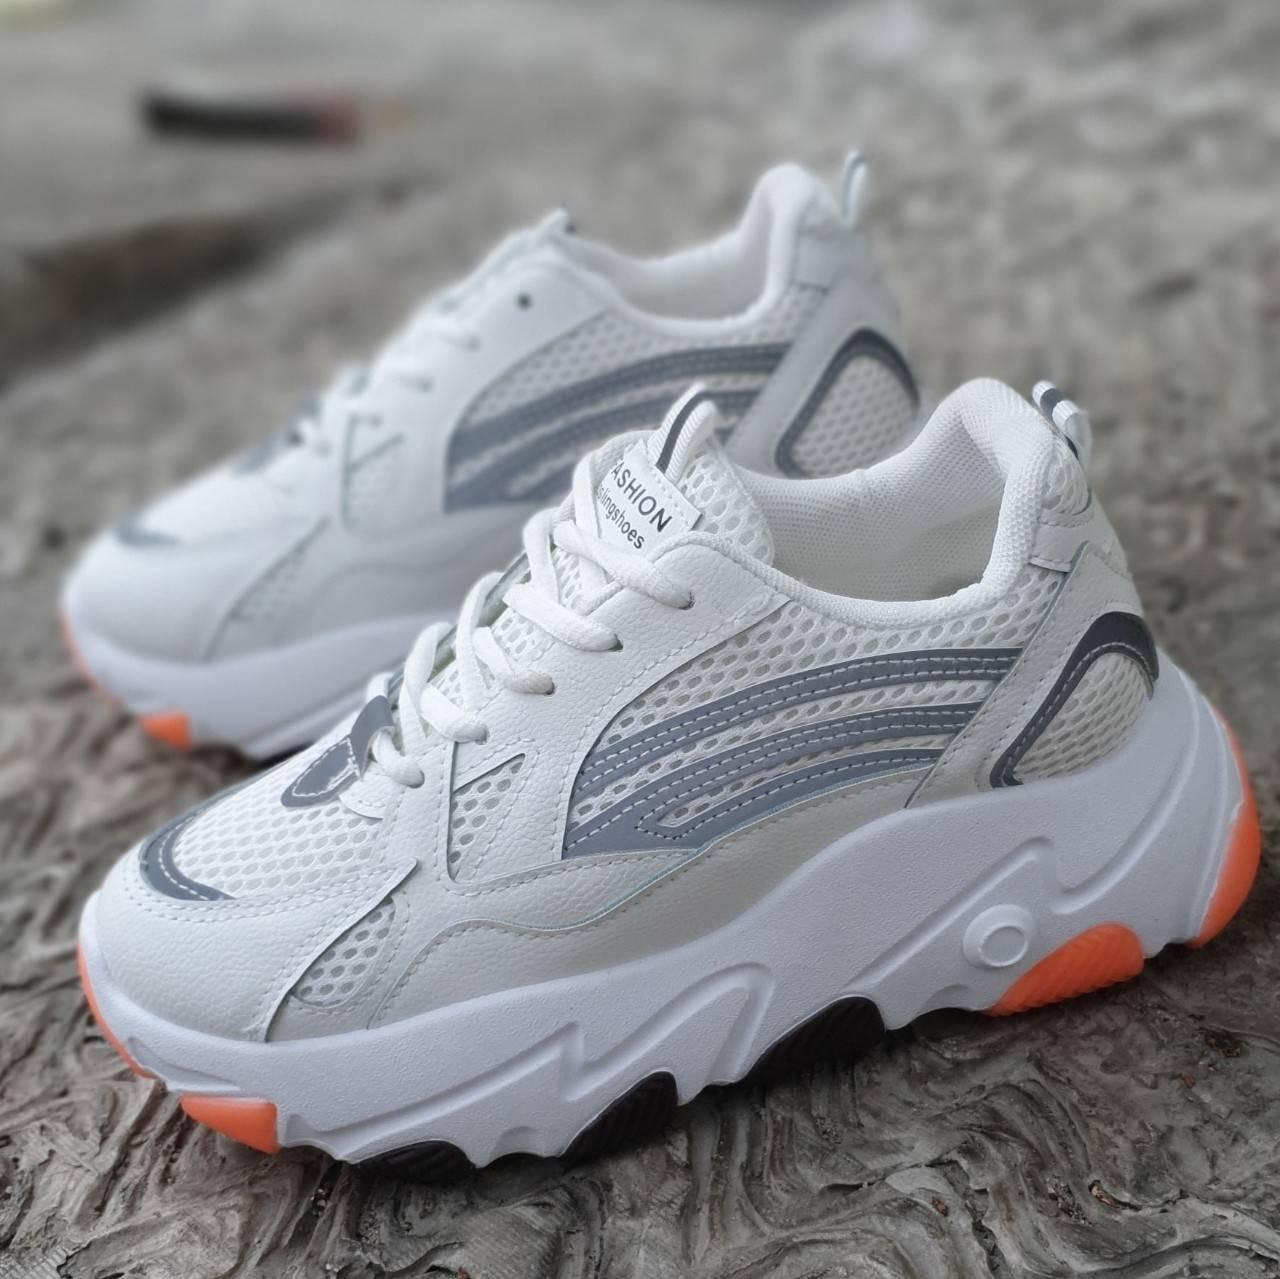 Sepatu Fashion Wanita Import Premium BNIB - Grey ...